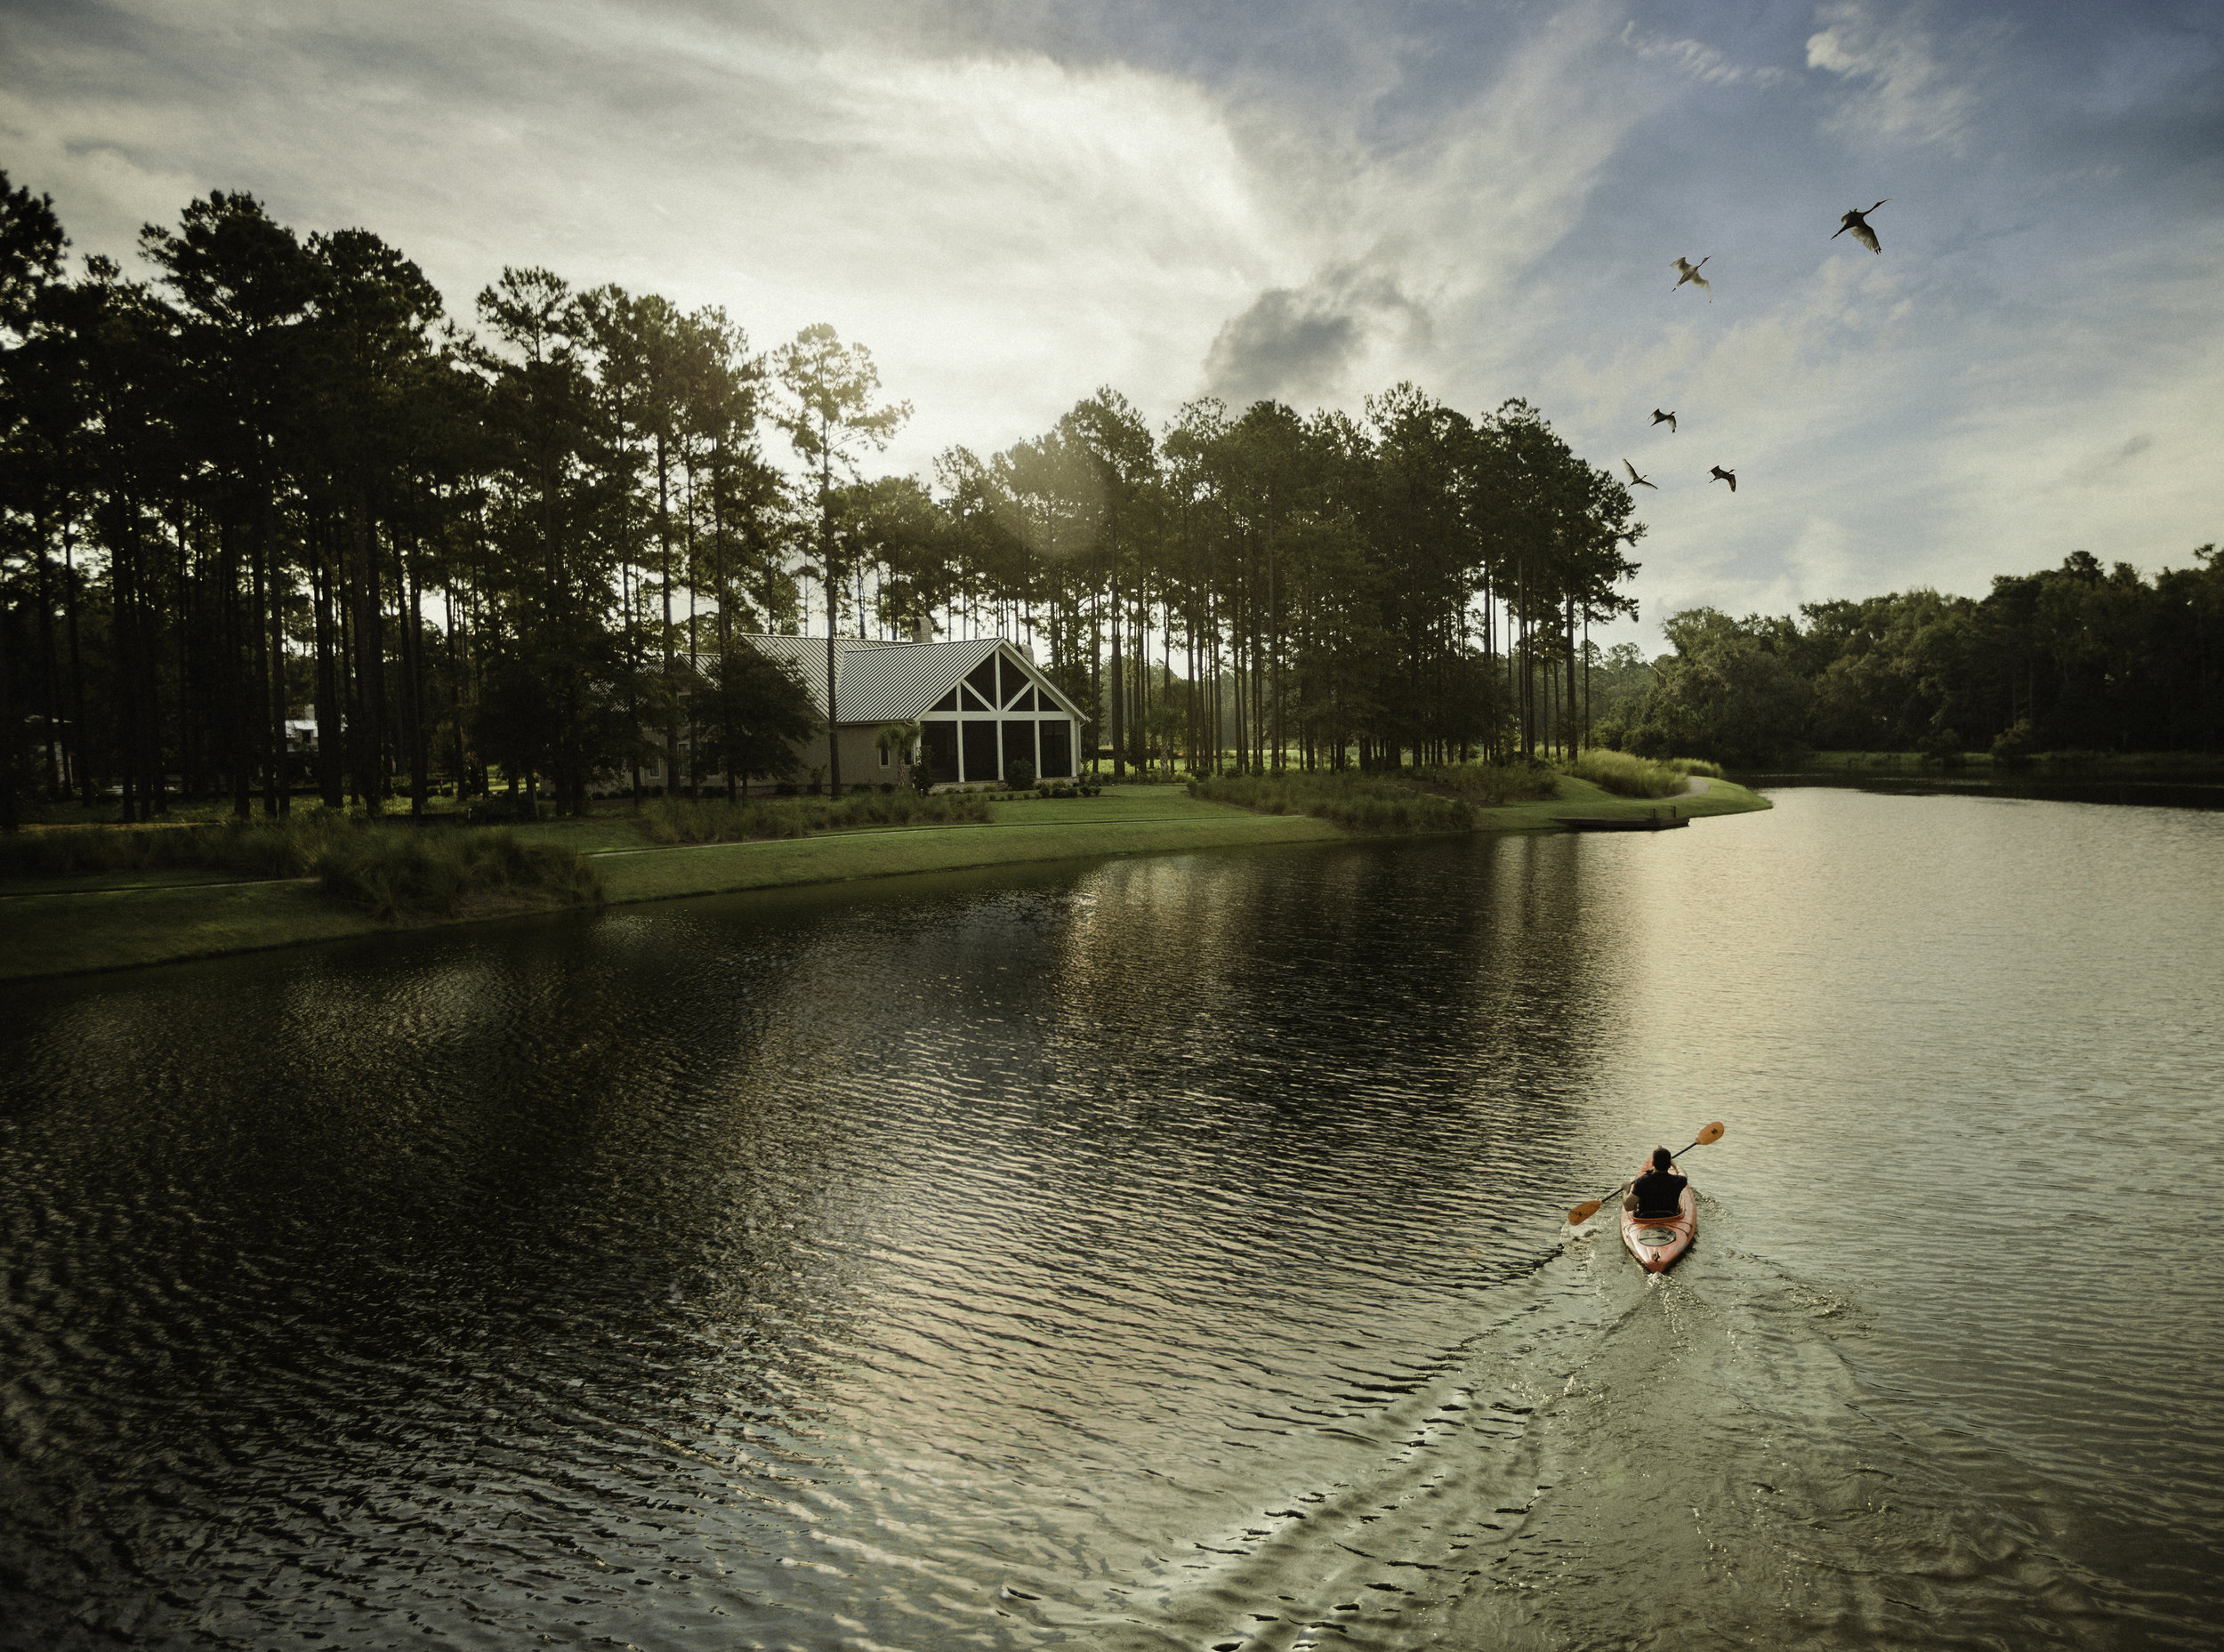 palmettobluff_rustywilliams_kayaker.jpg